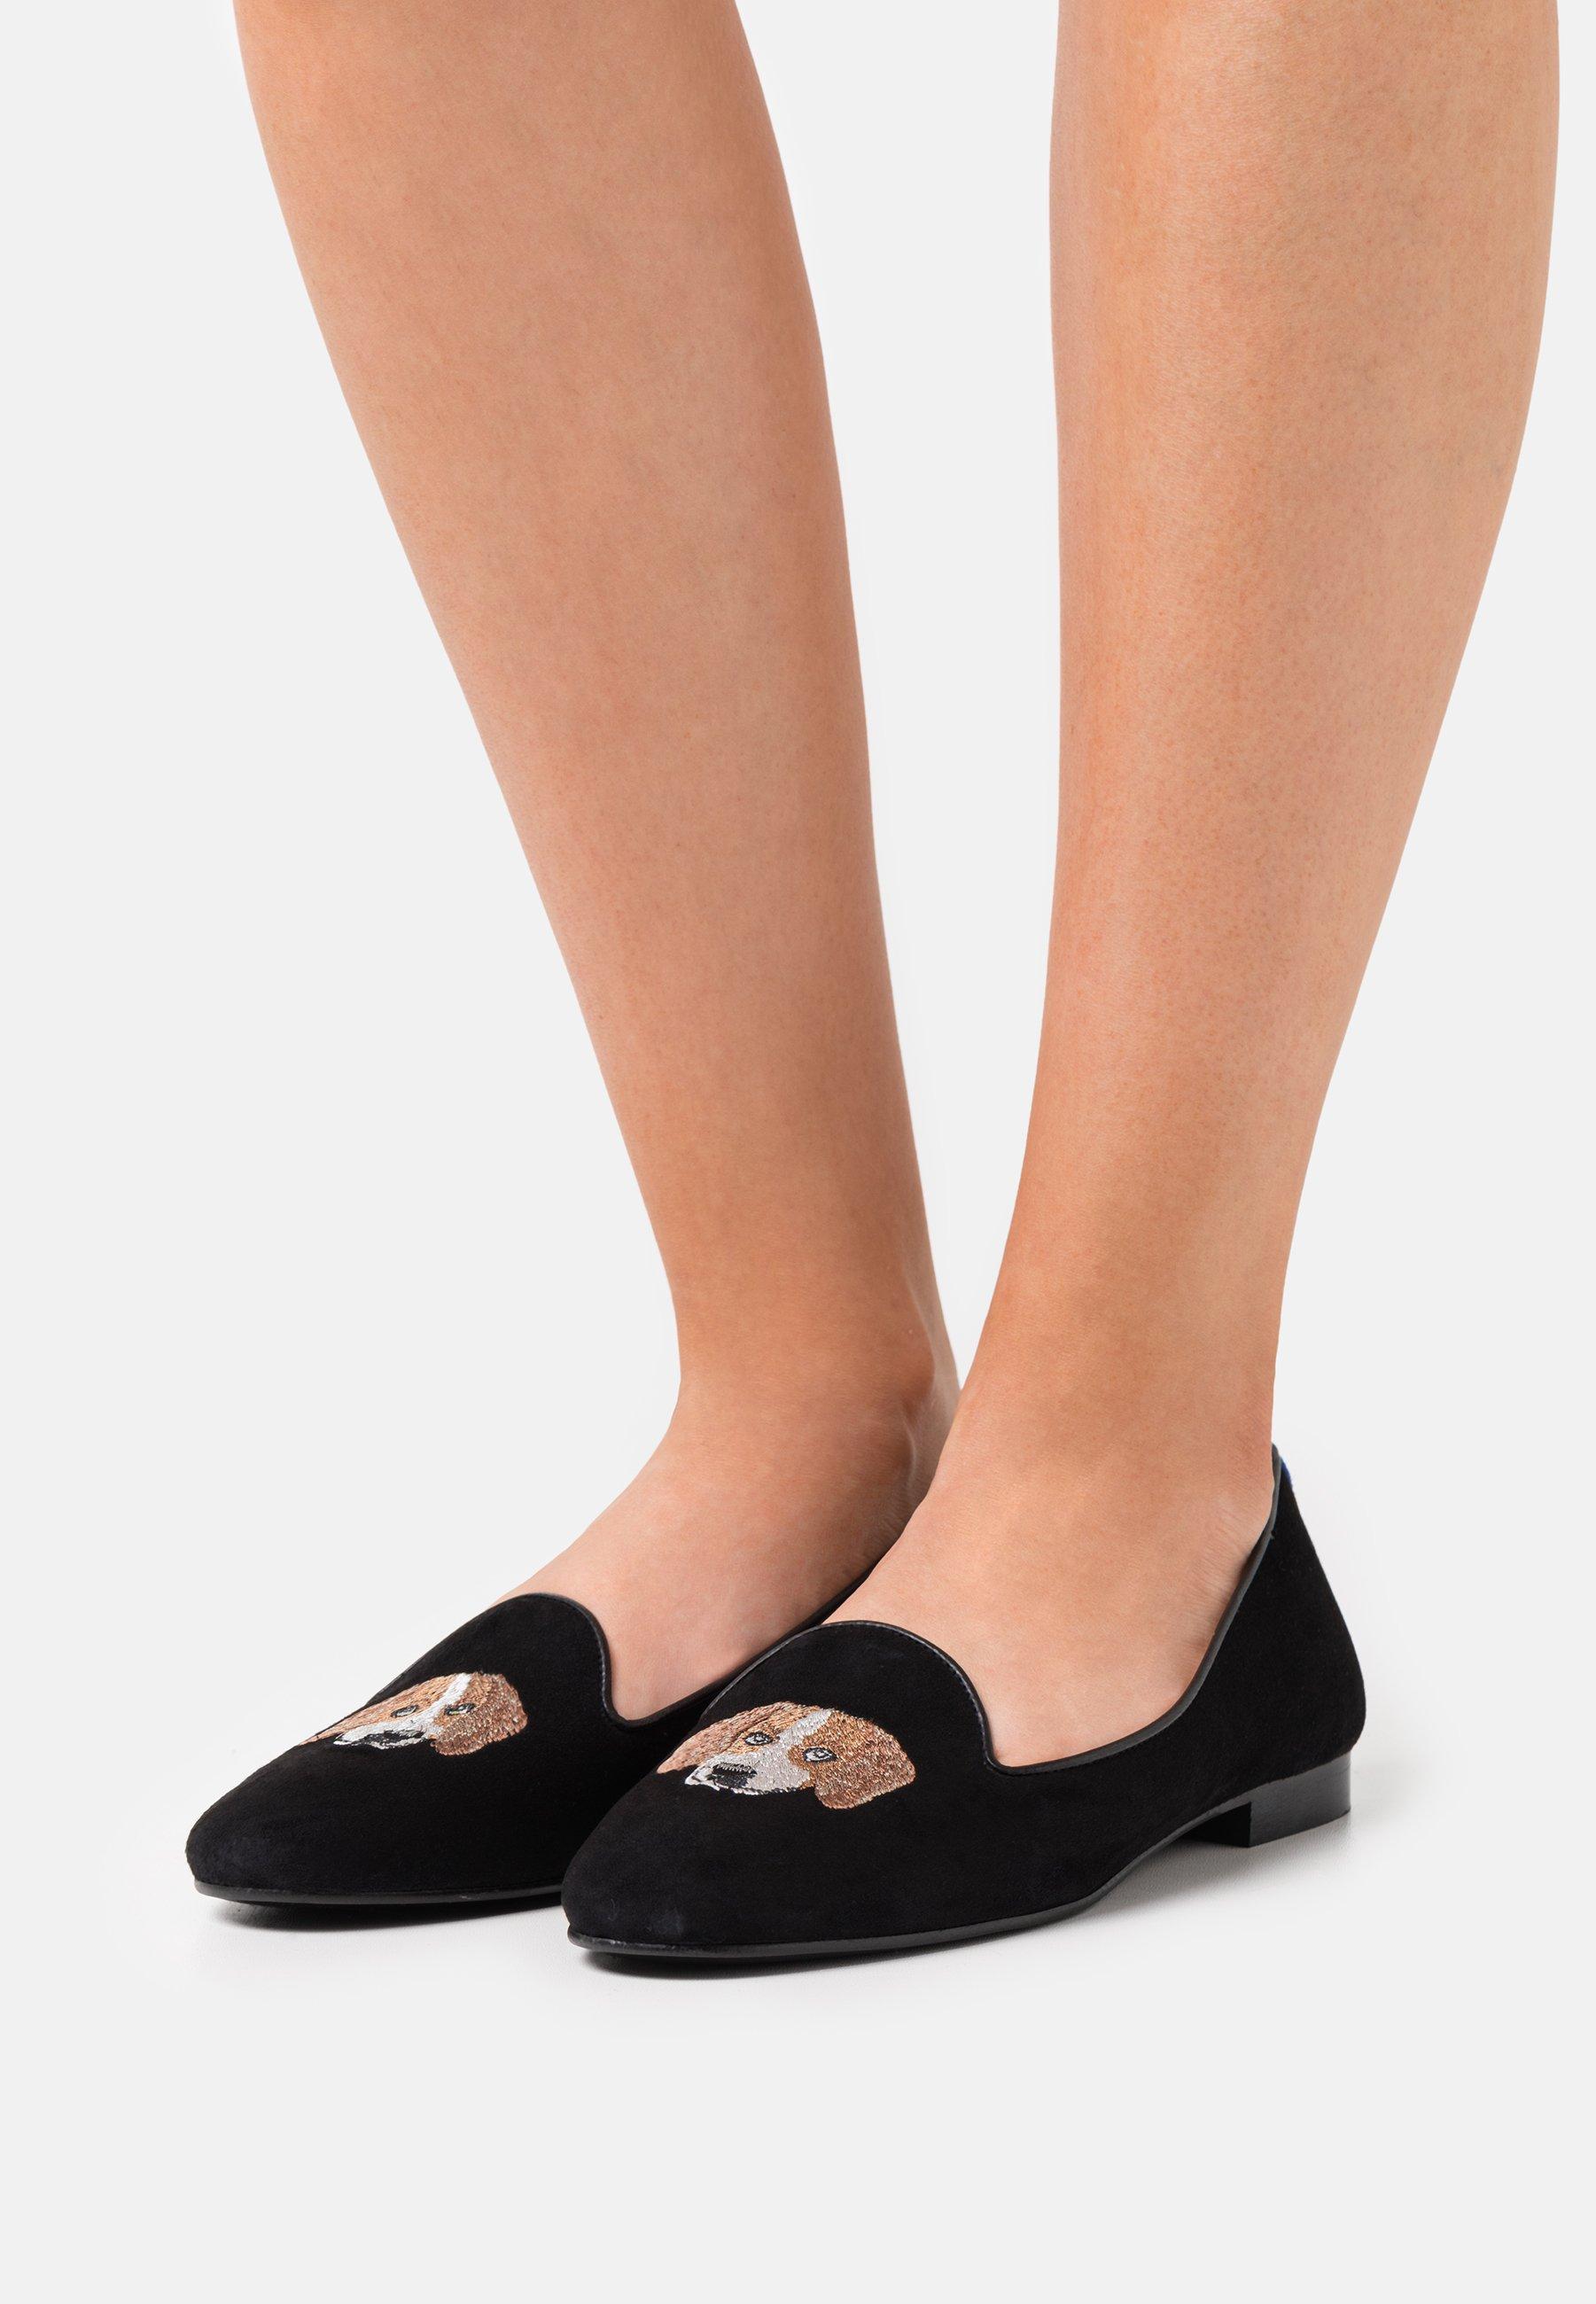 Damen FRANCOIS PUPPY - Slipper - black